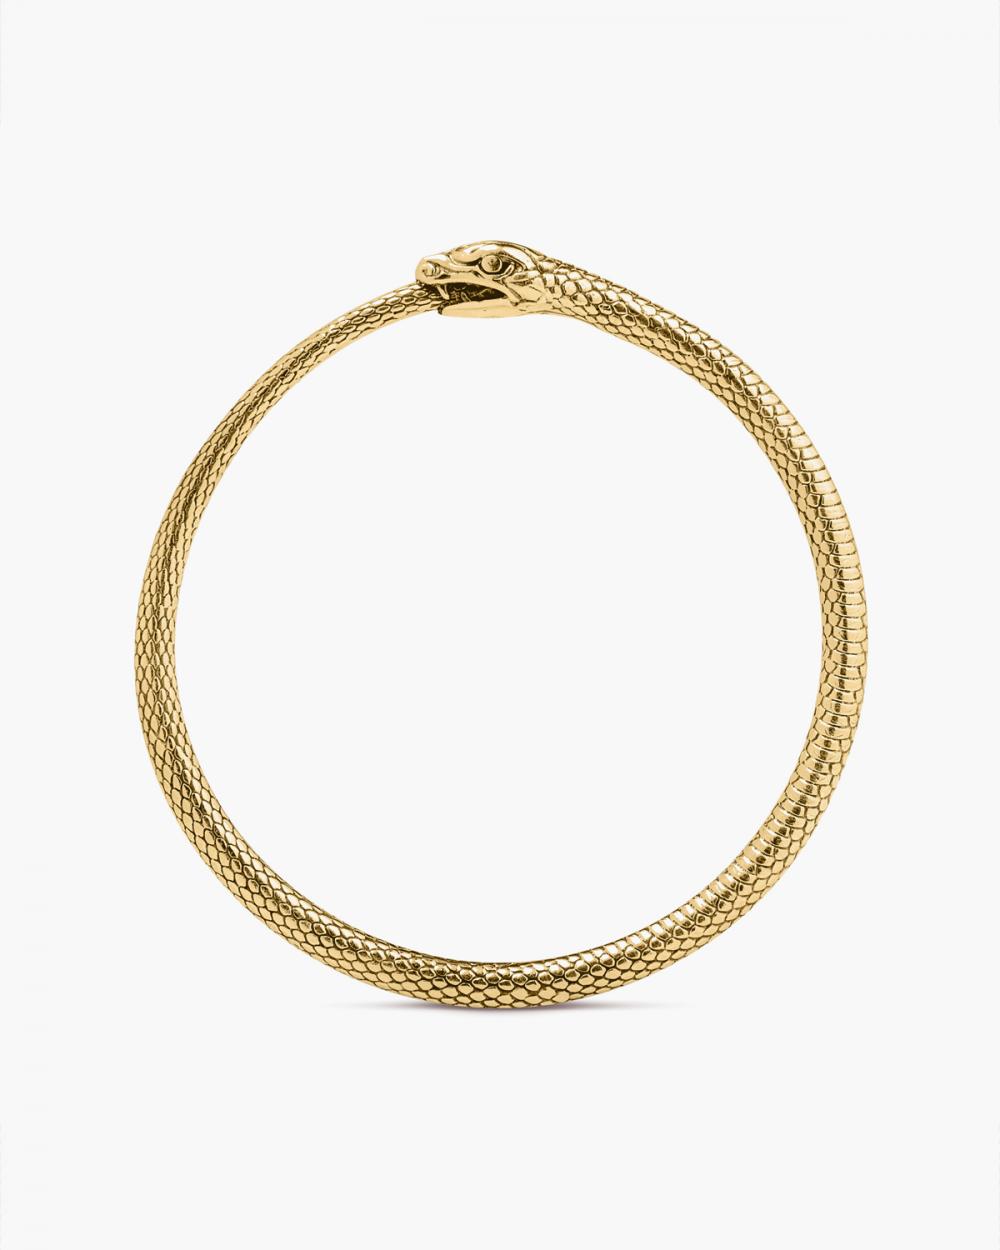 Bracelets YELLOW GOLD OUROBOROS BRACELET NOVE25